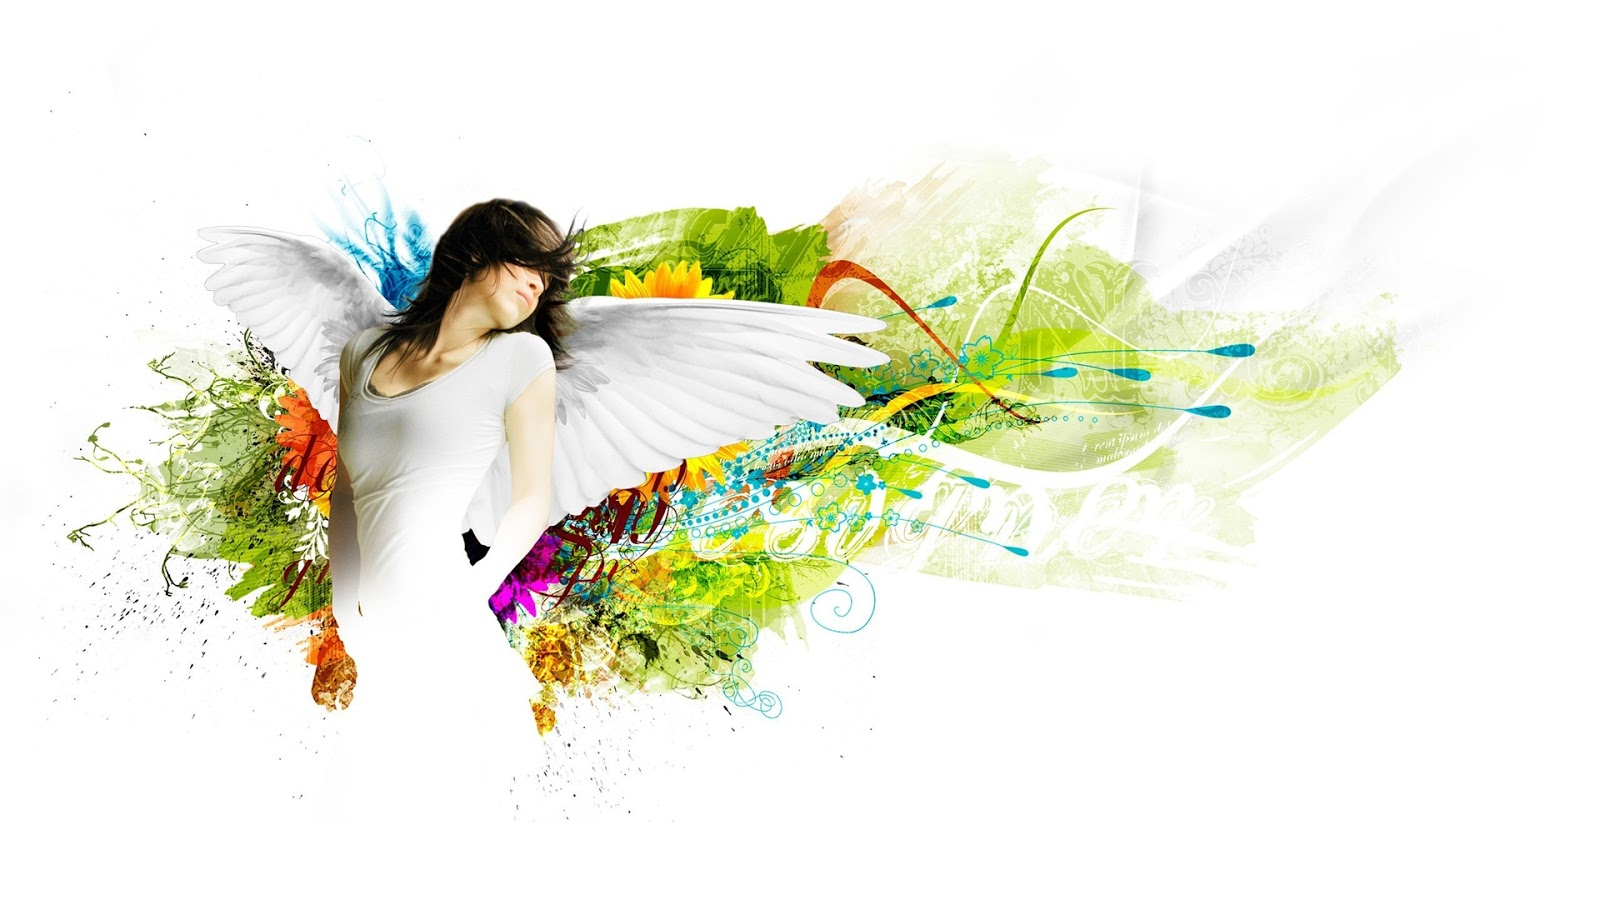 http://2.bp.blogspot.com/-ELlGrXN5yg8/UPQXBvi2lBI/AAAAAAAANnE/H55Kqd7cxYY/s1600/angel-1080.jpg